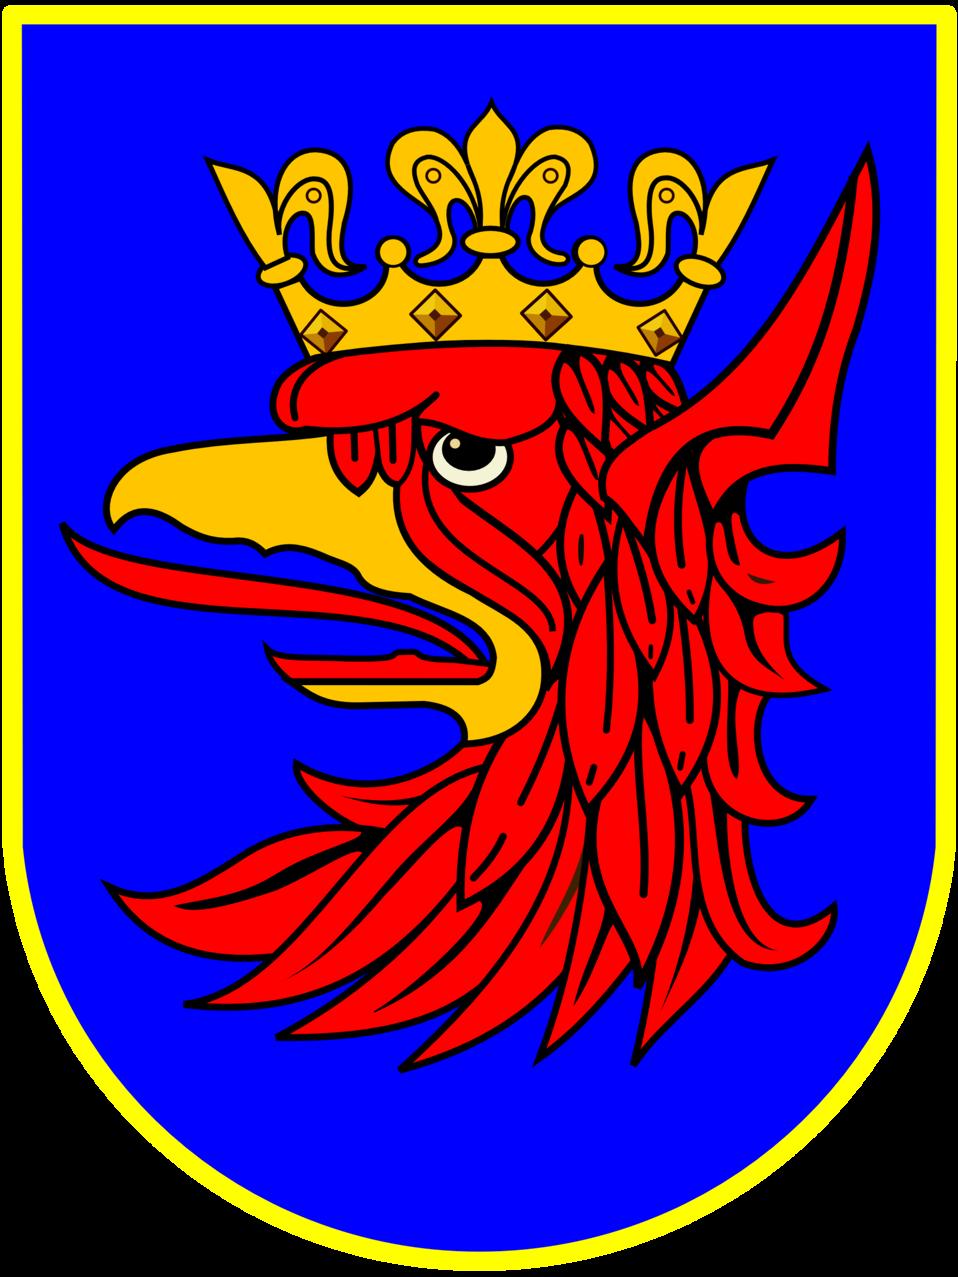 Szczecin - coat of arms